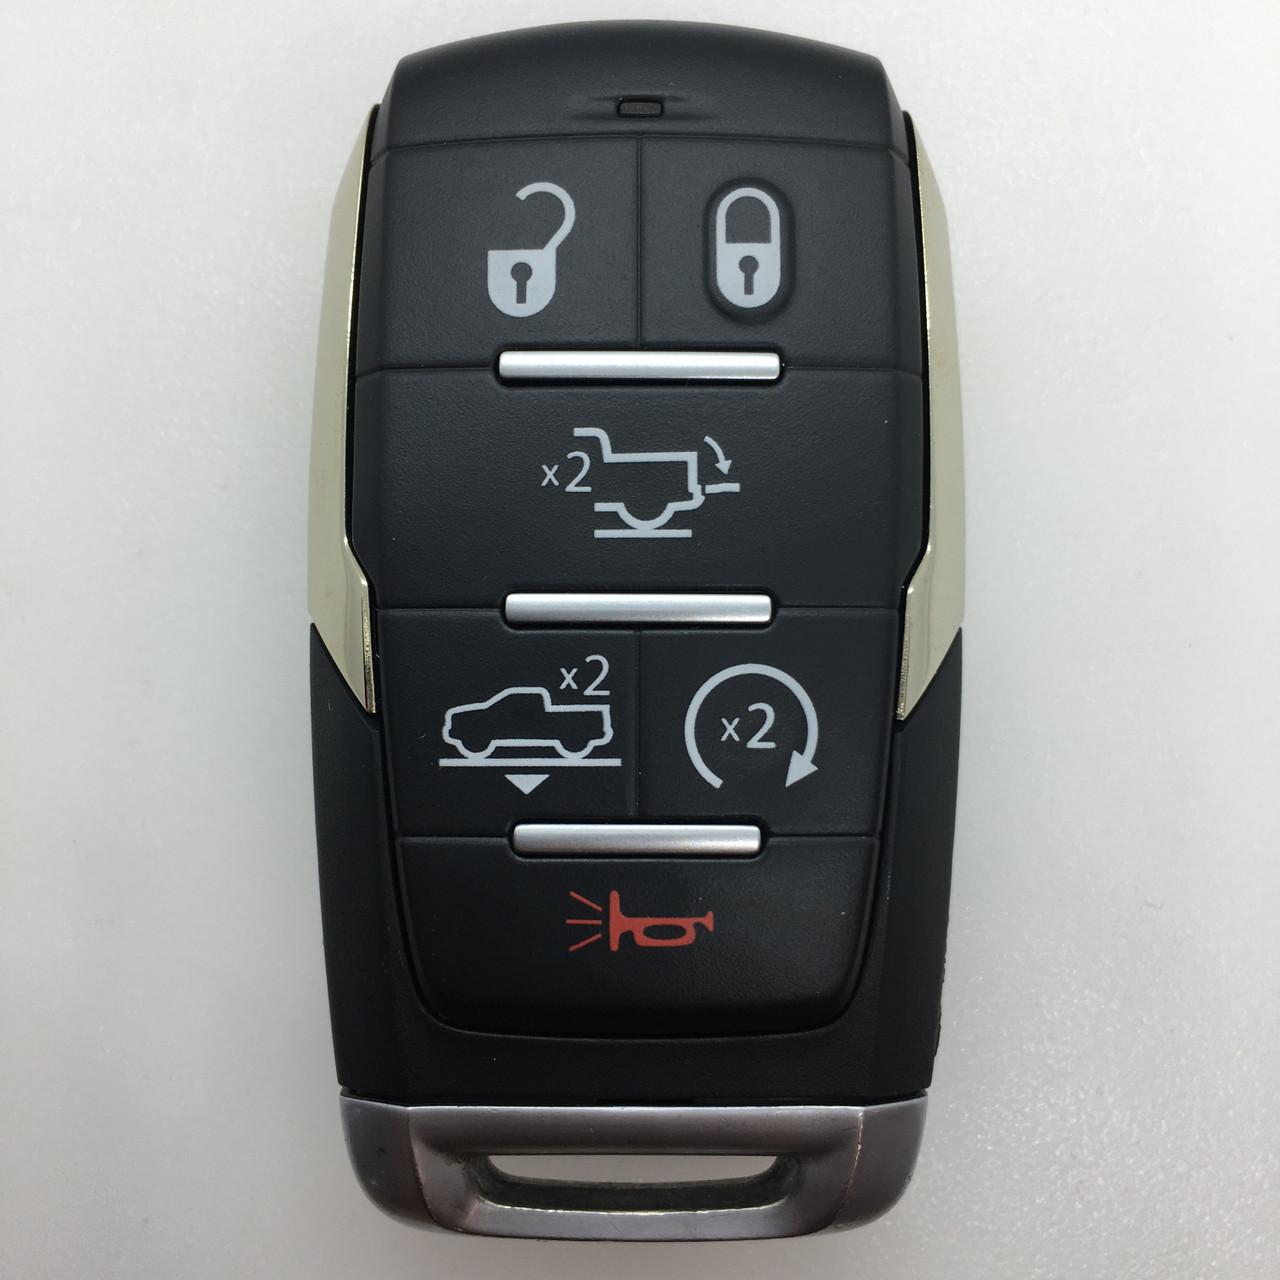 RAM Ram 1500 Longhorn 68312808AD OHT4882056 5461A-4882056 Key - Prox Smart